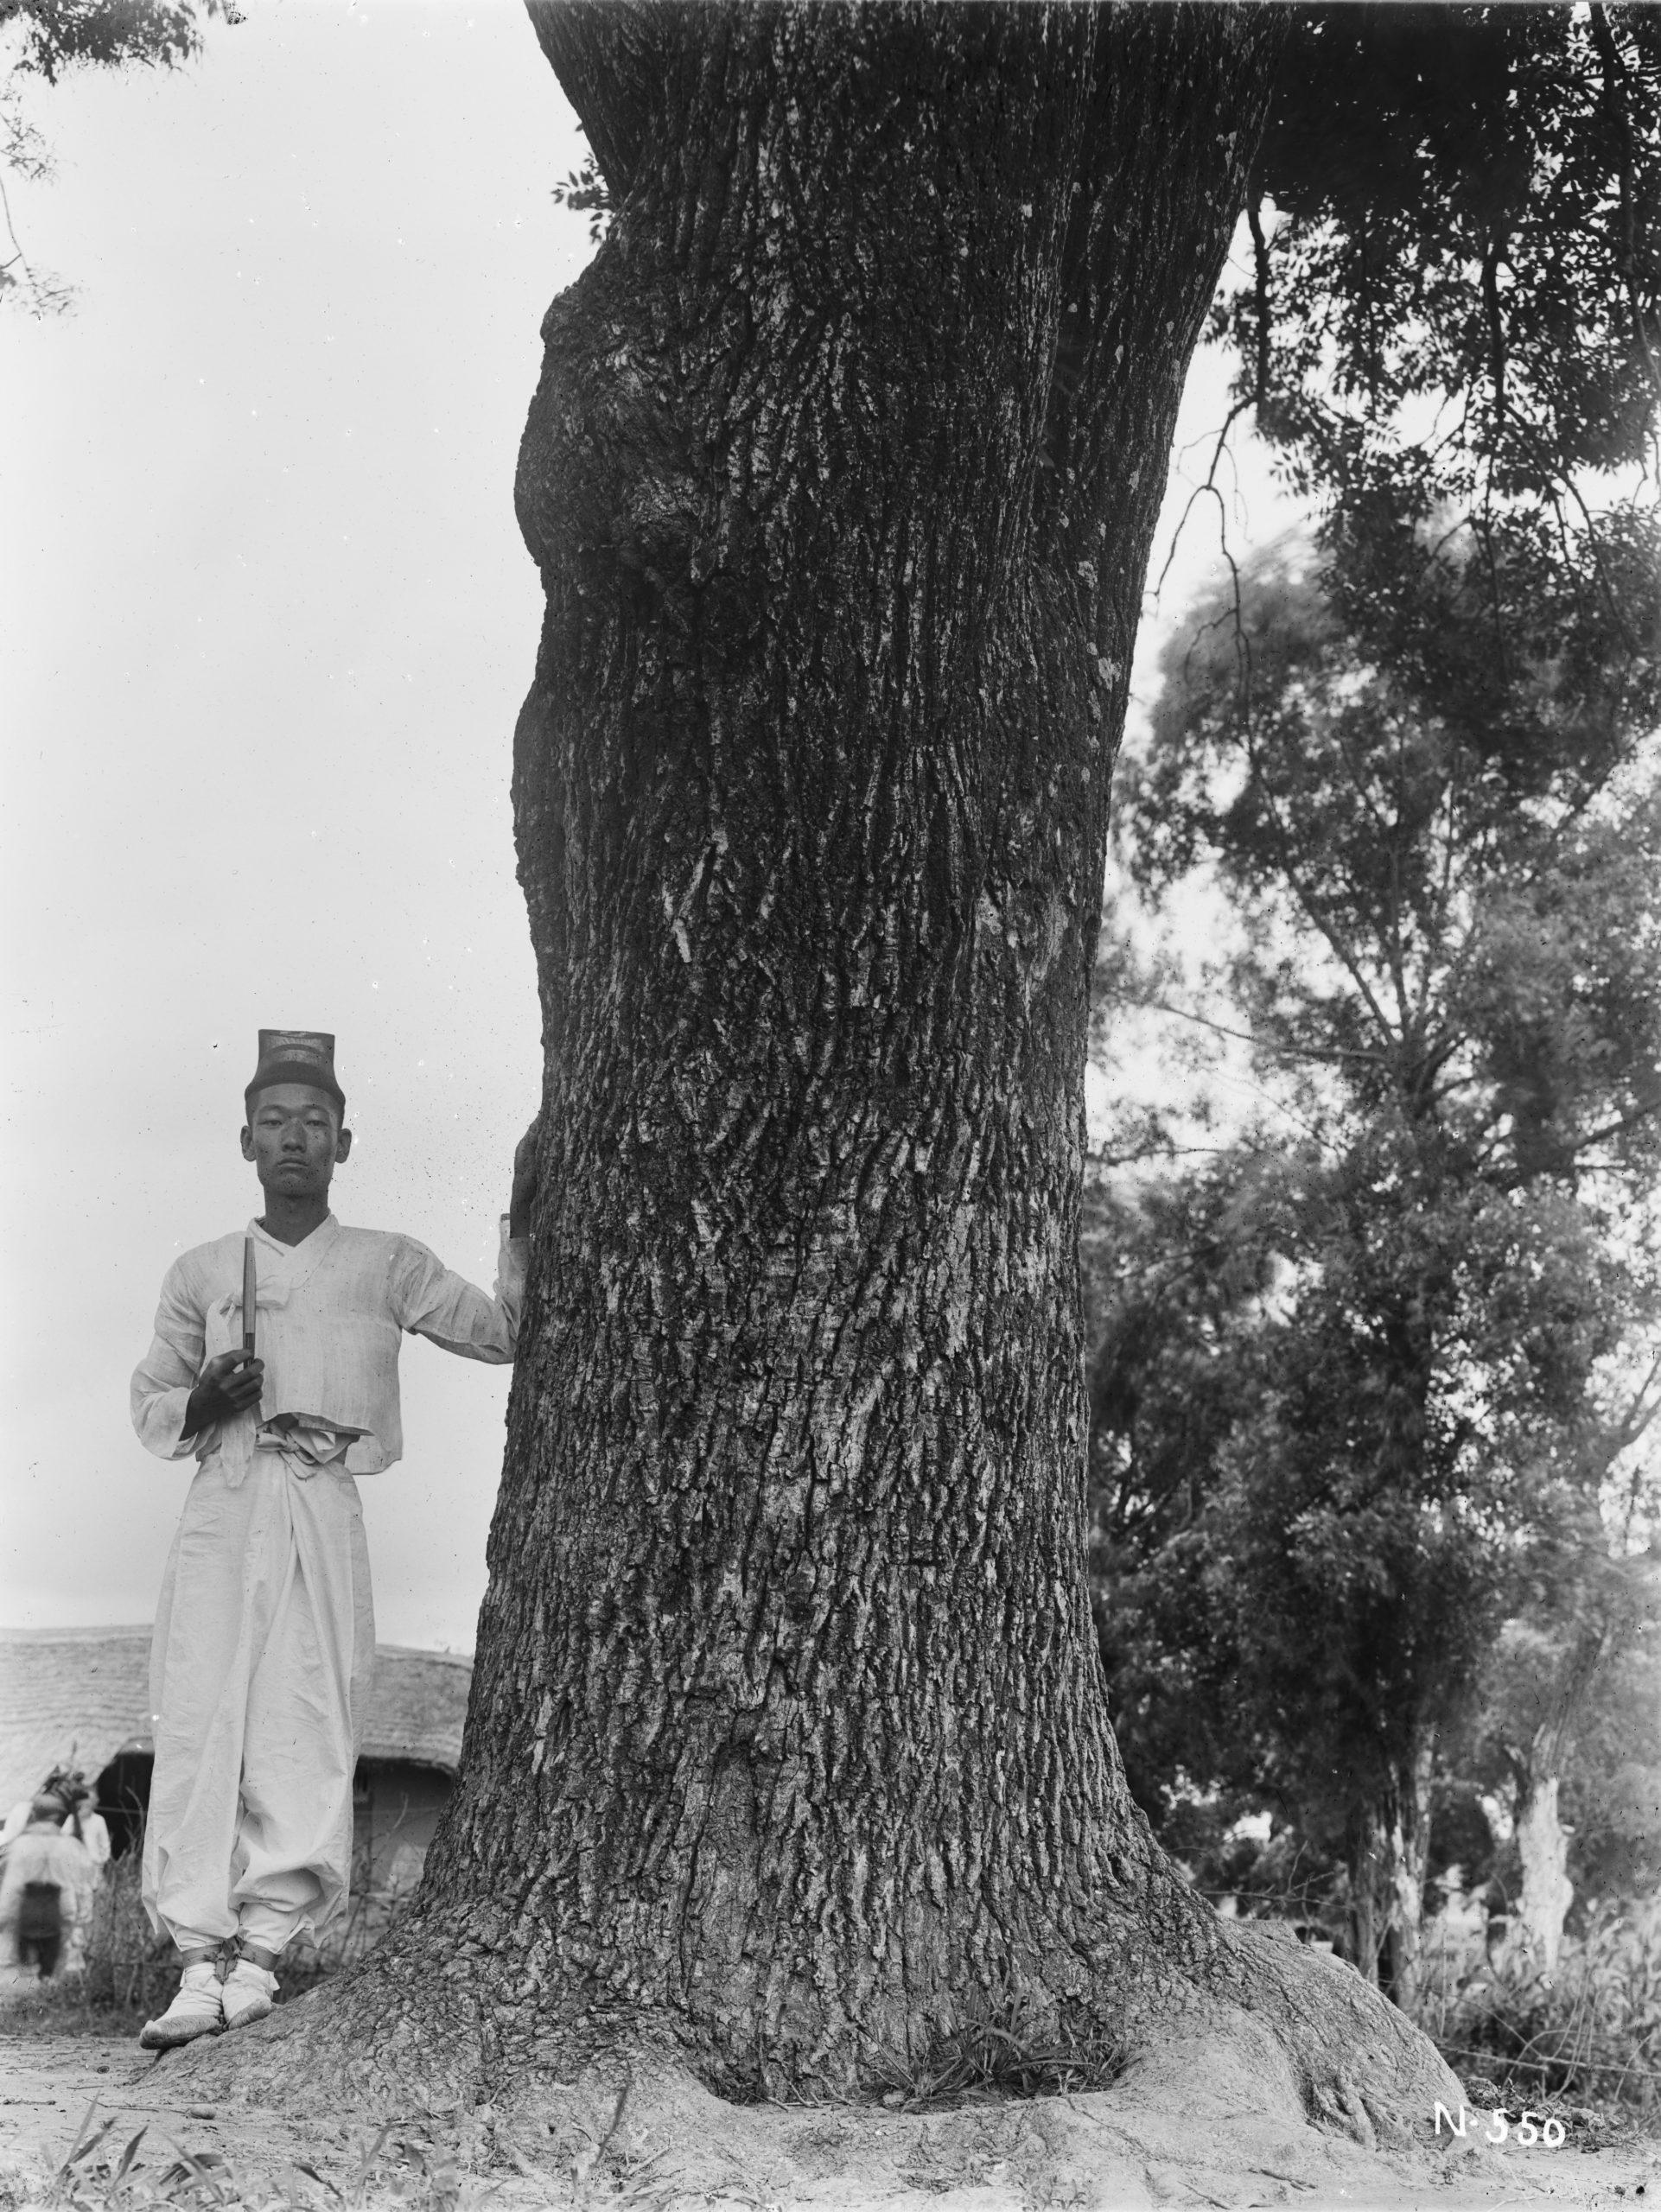 A man holding a fan stands beside a large Manchurian ash (Fraxinus mandshurica). Photograph by Ernest Wilson in July 1918 near Mochuri, Korea.